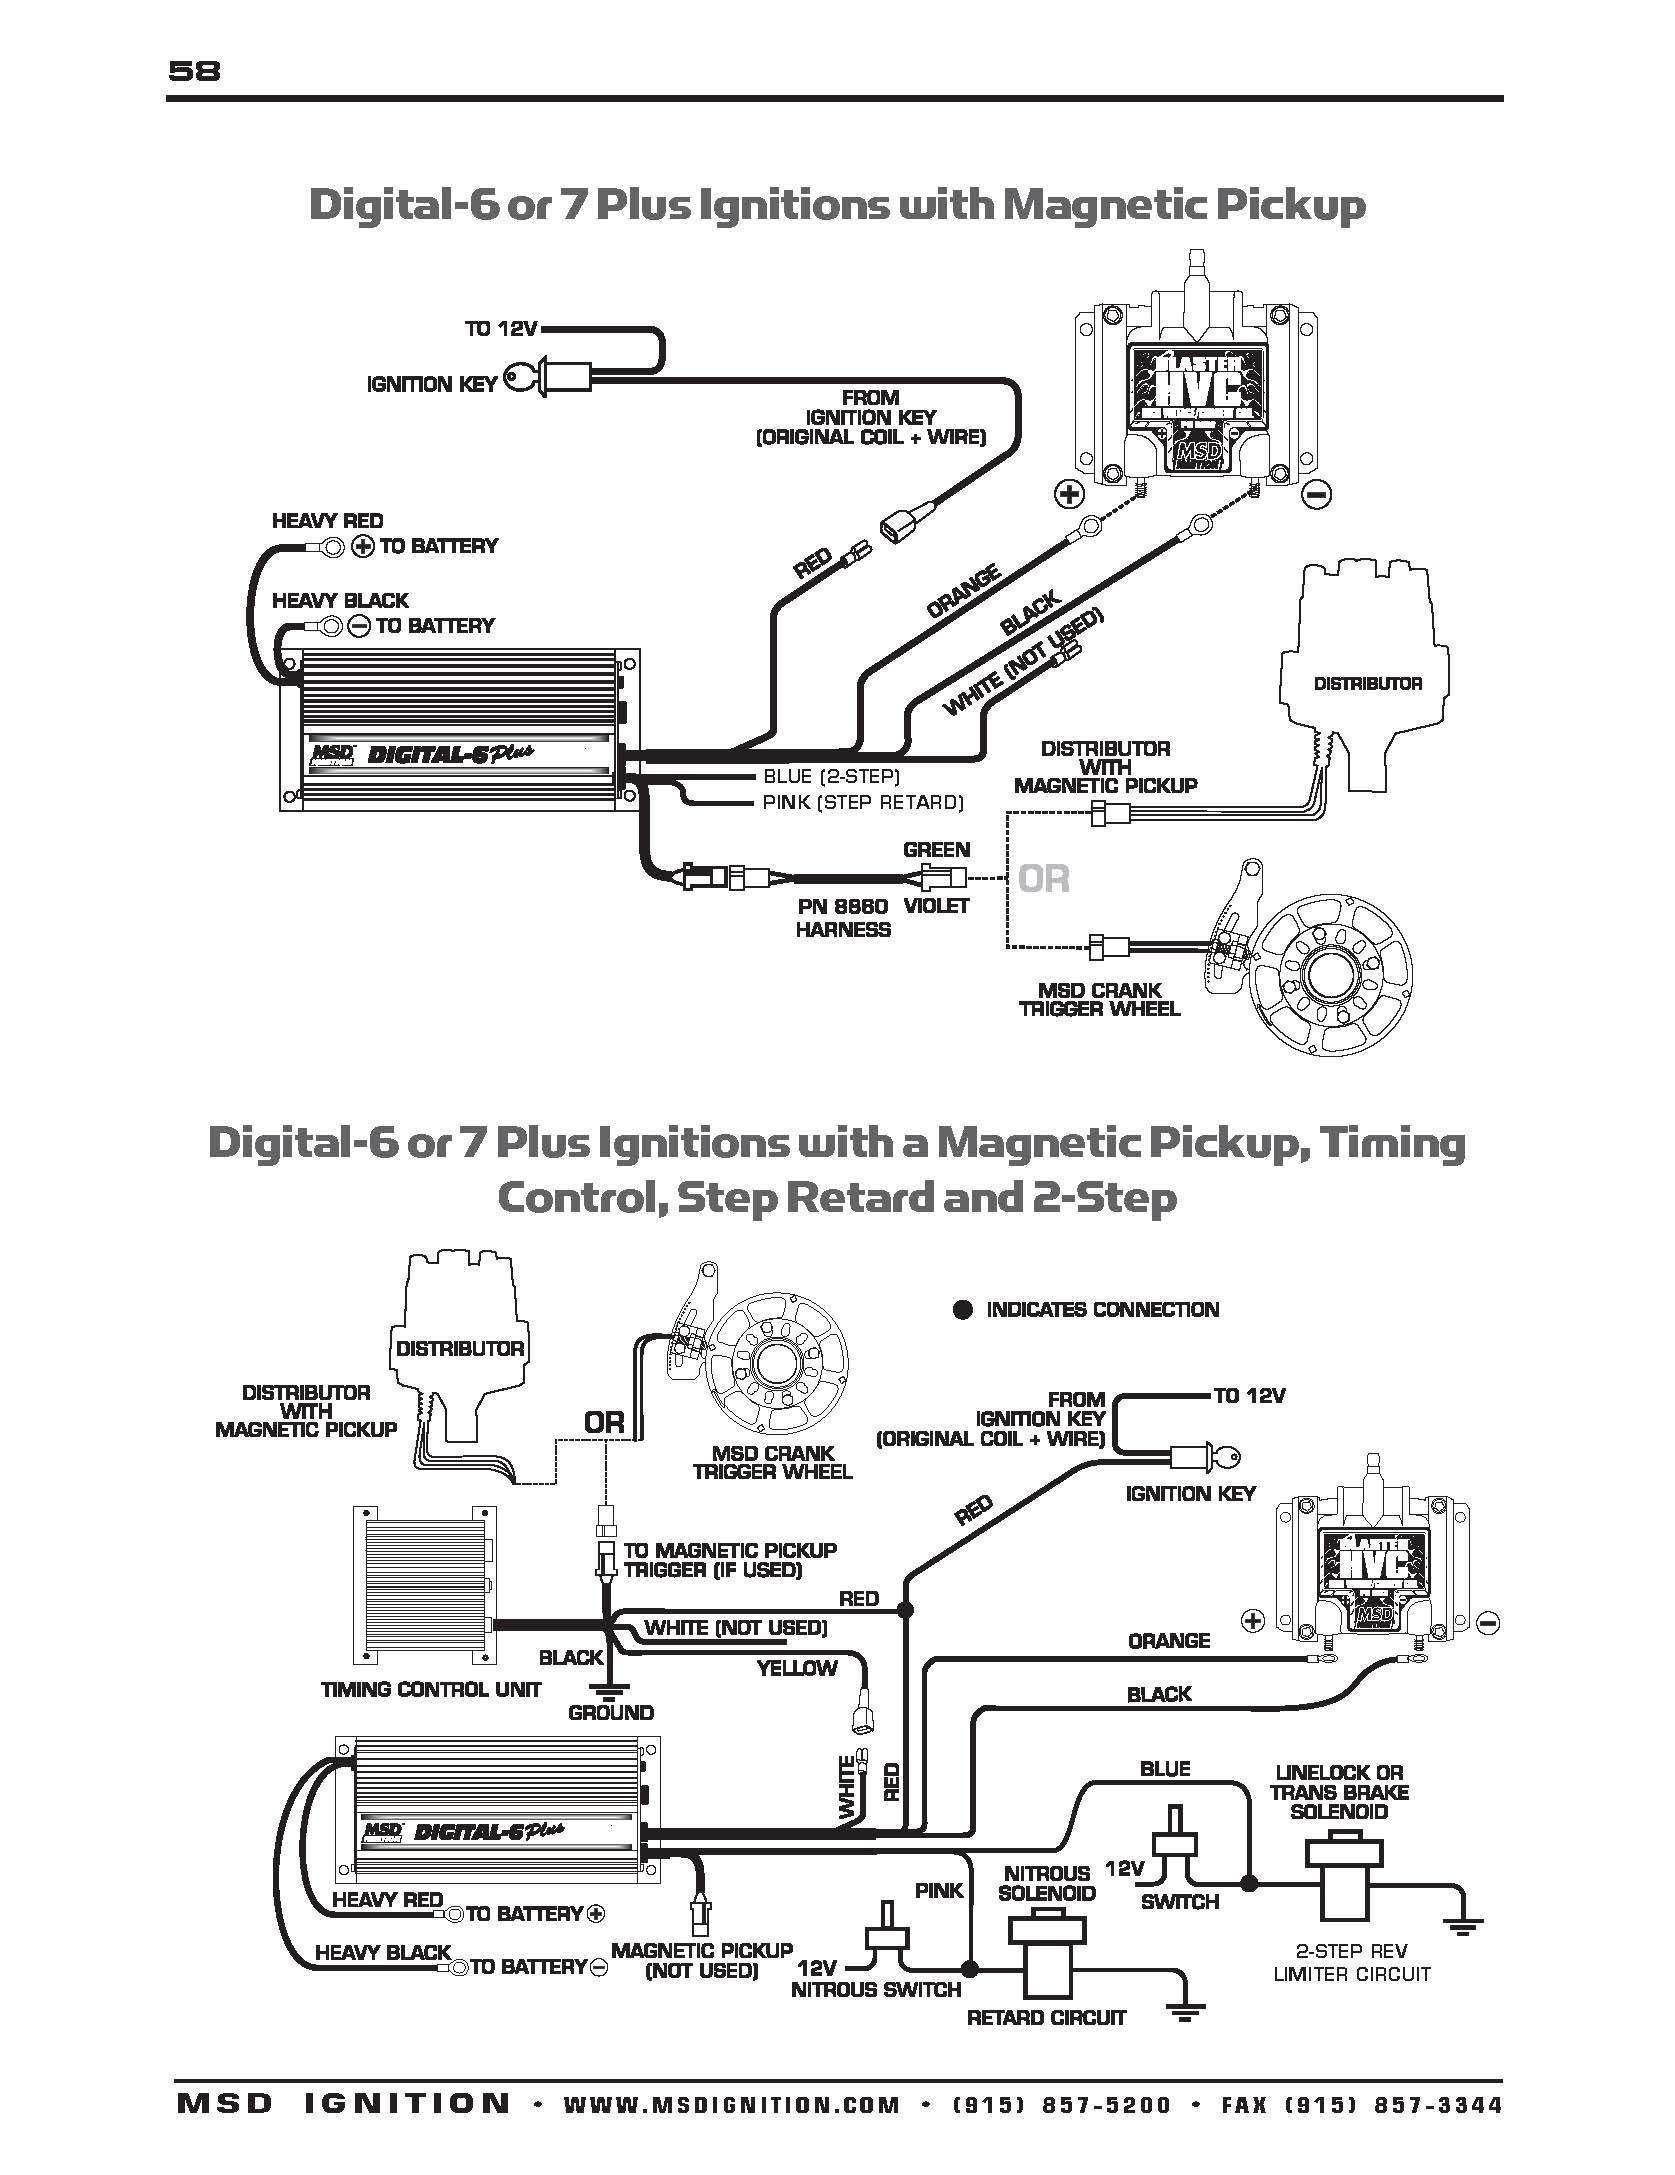 msd digital 6 wiring diagram wire center u2022 rh 66 42 83 38 MSD 8950 Wiring Diagram Ford MSD 6AL Wiring Diagram